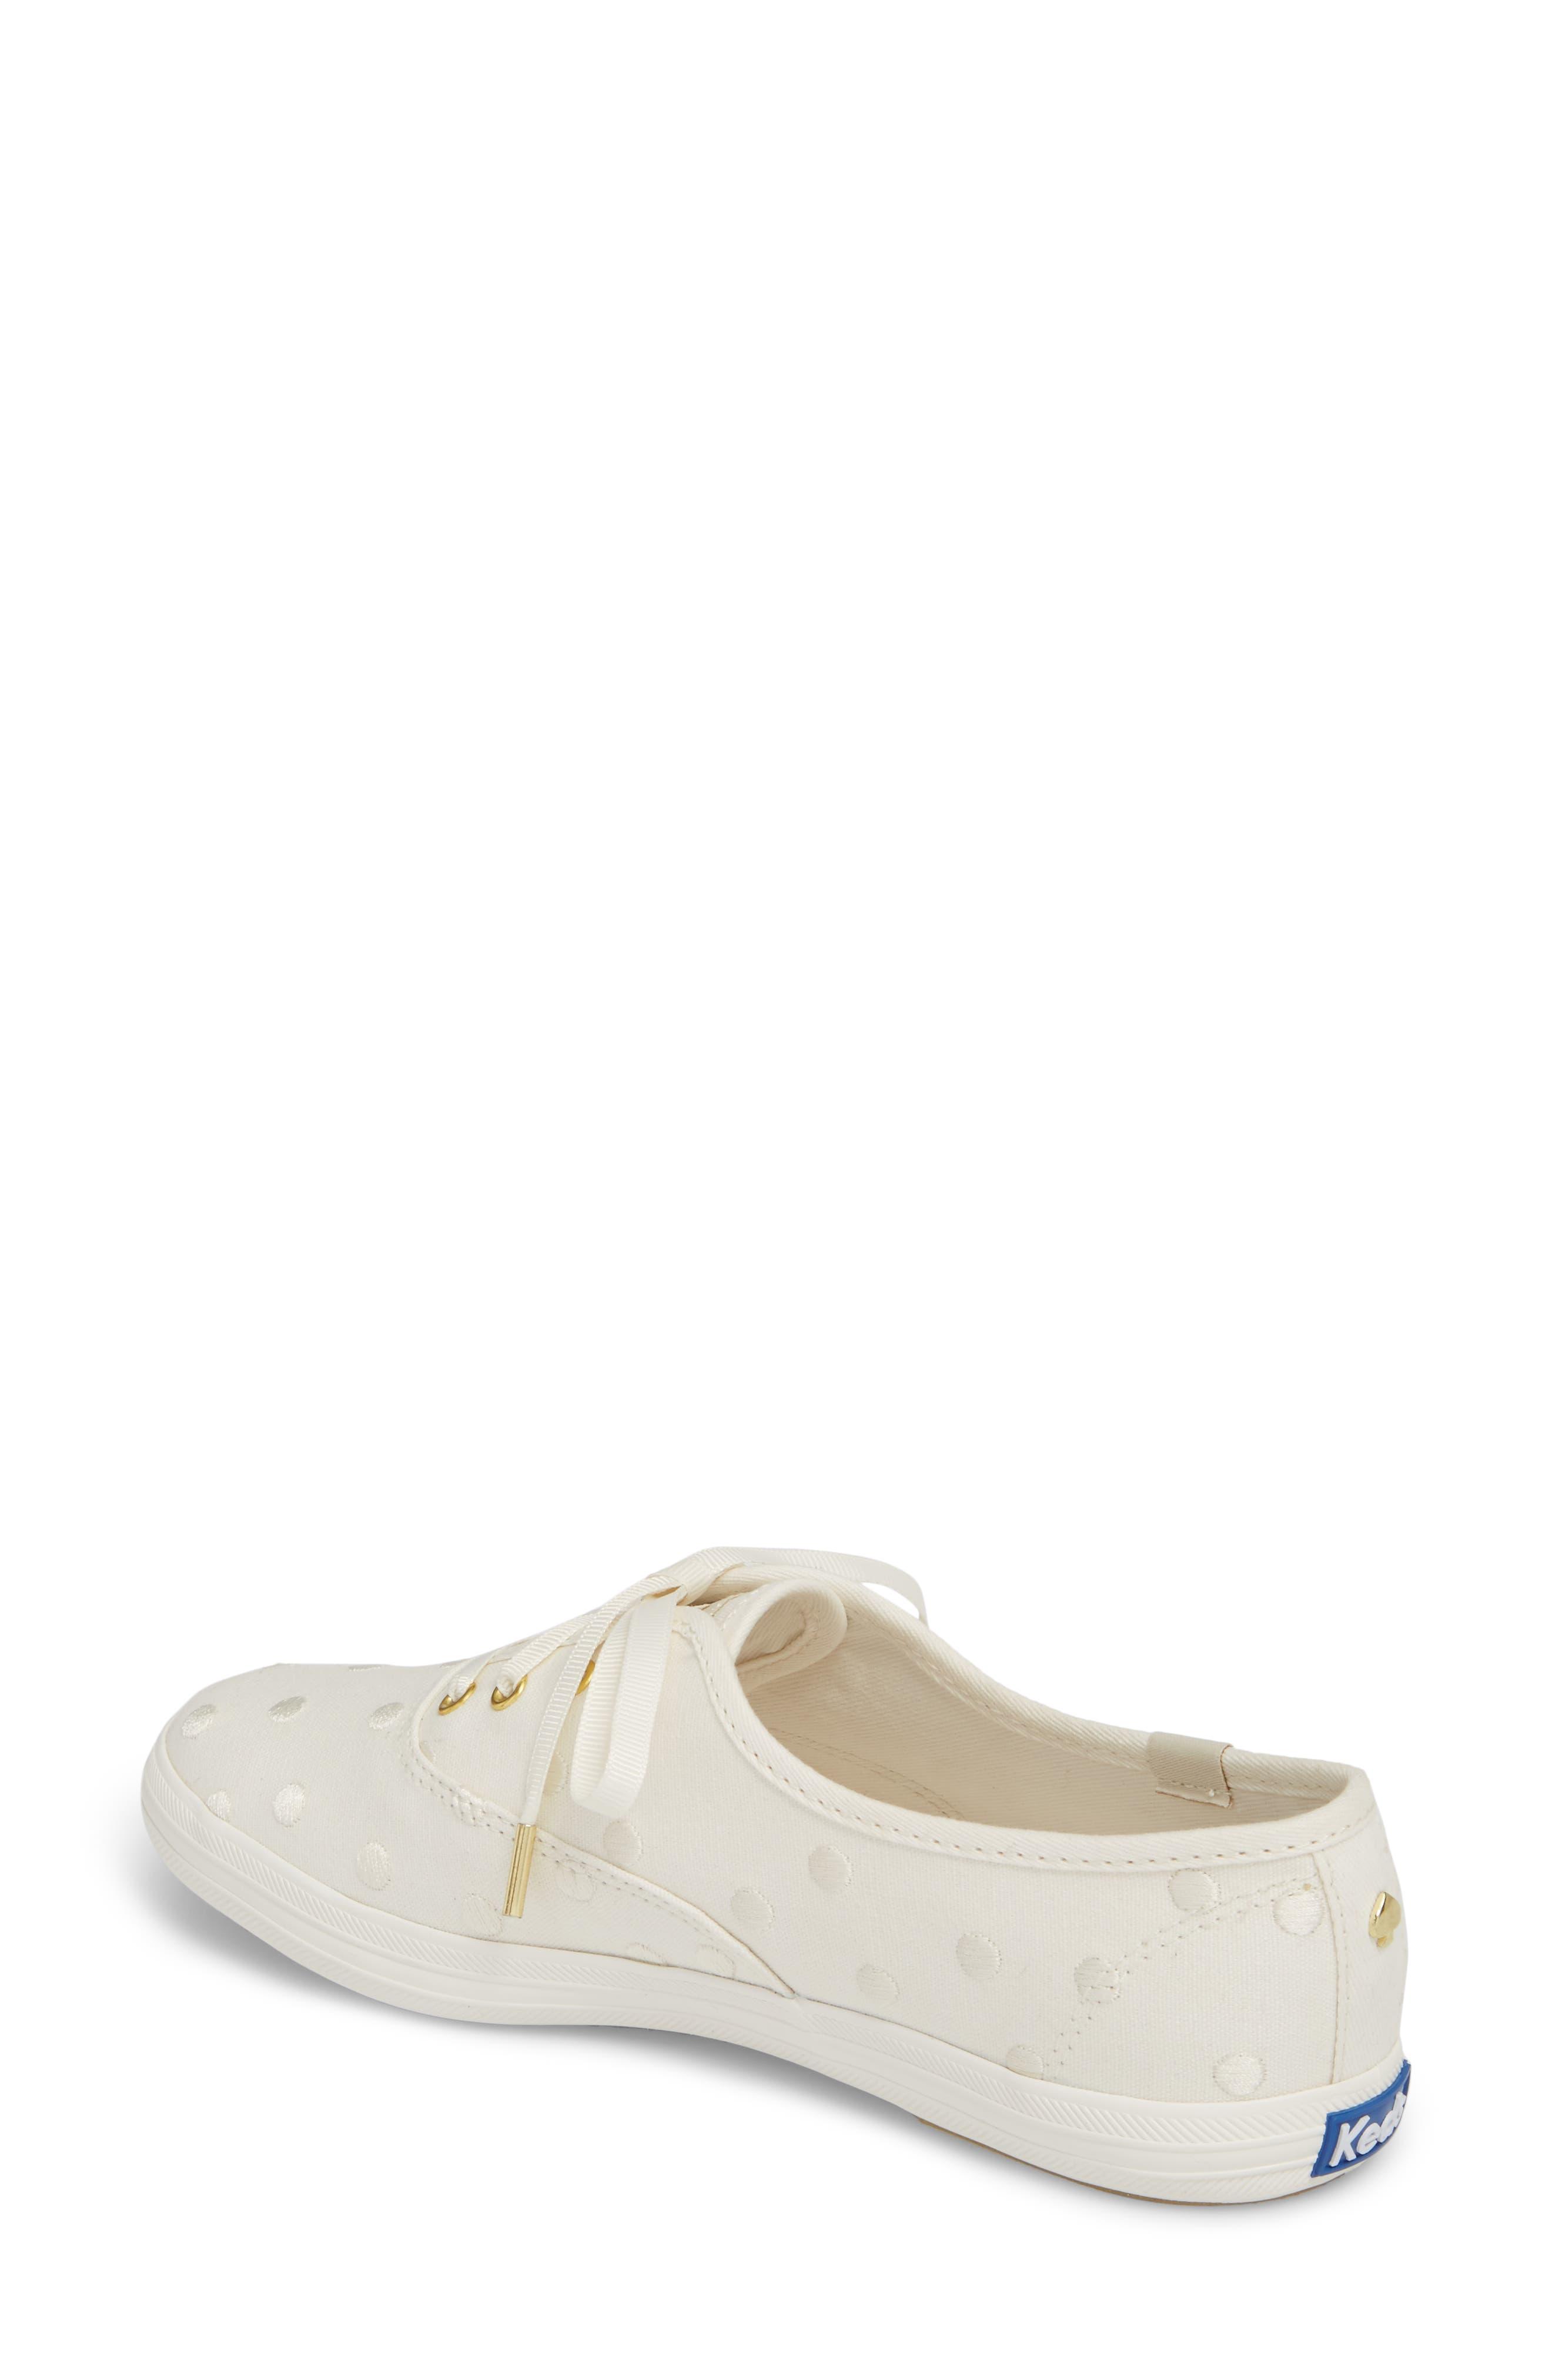 KEDS<SUP>®</SUP> FOR KATE SPADE NEW YORK, champion dancing dot sneaker, Alternate thumbnail 2, color, WHITE